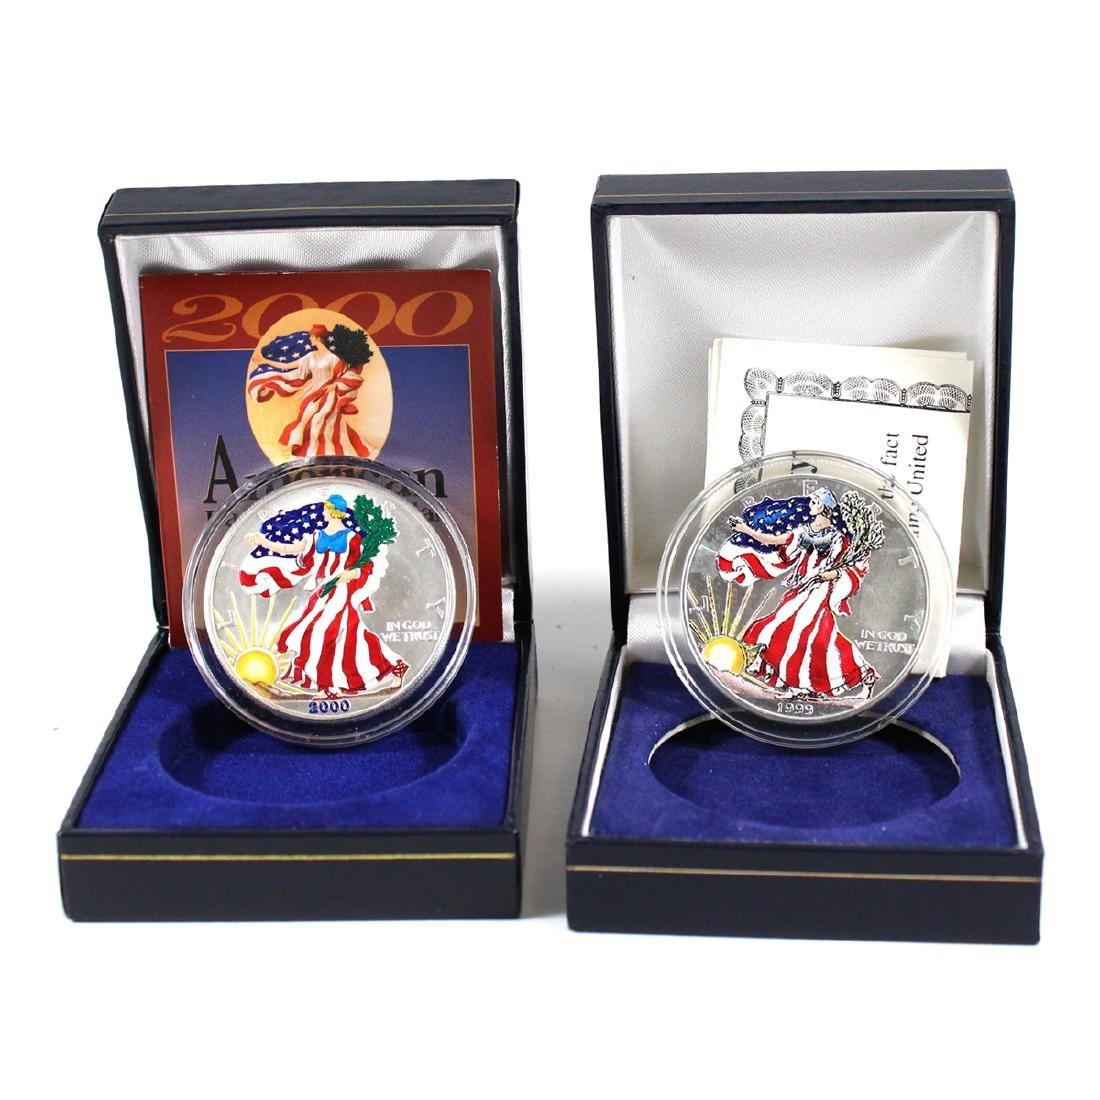 1999 & 2000 US American Eagle 1oz Fine Silver Coins in